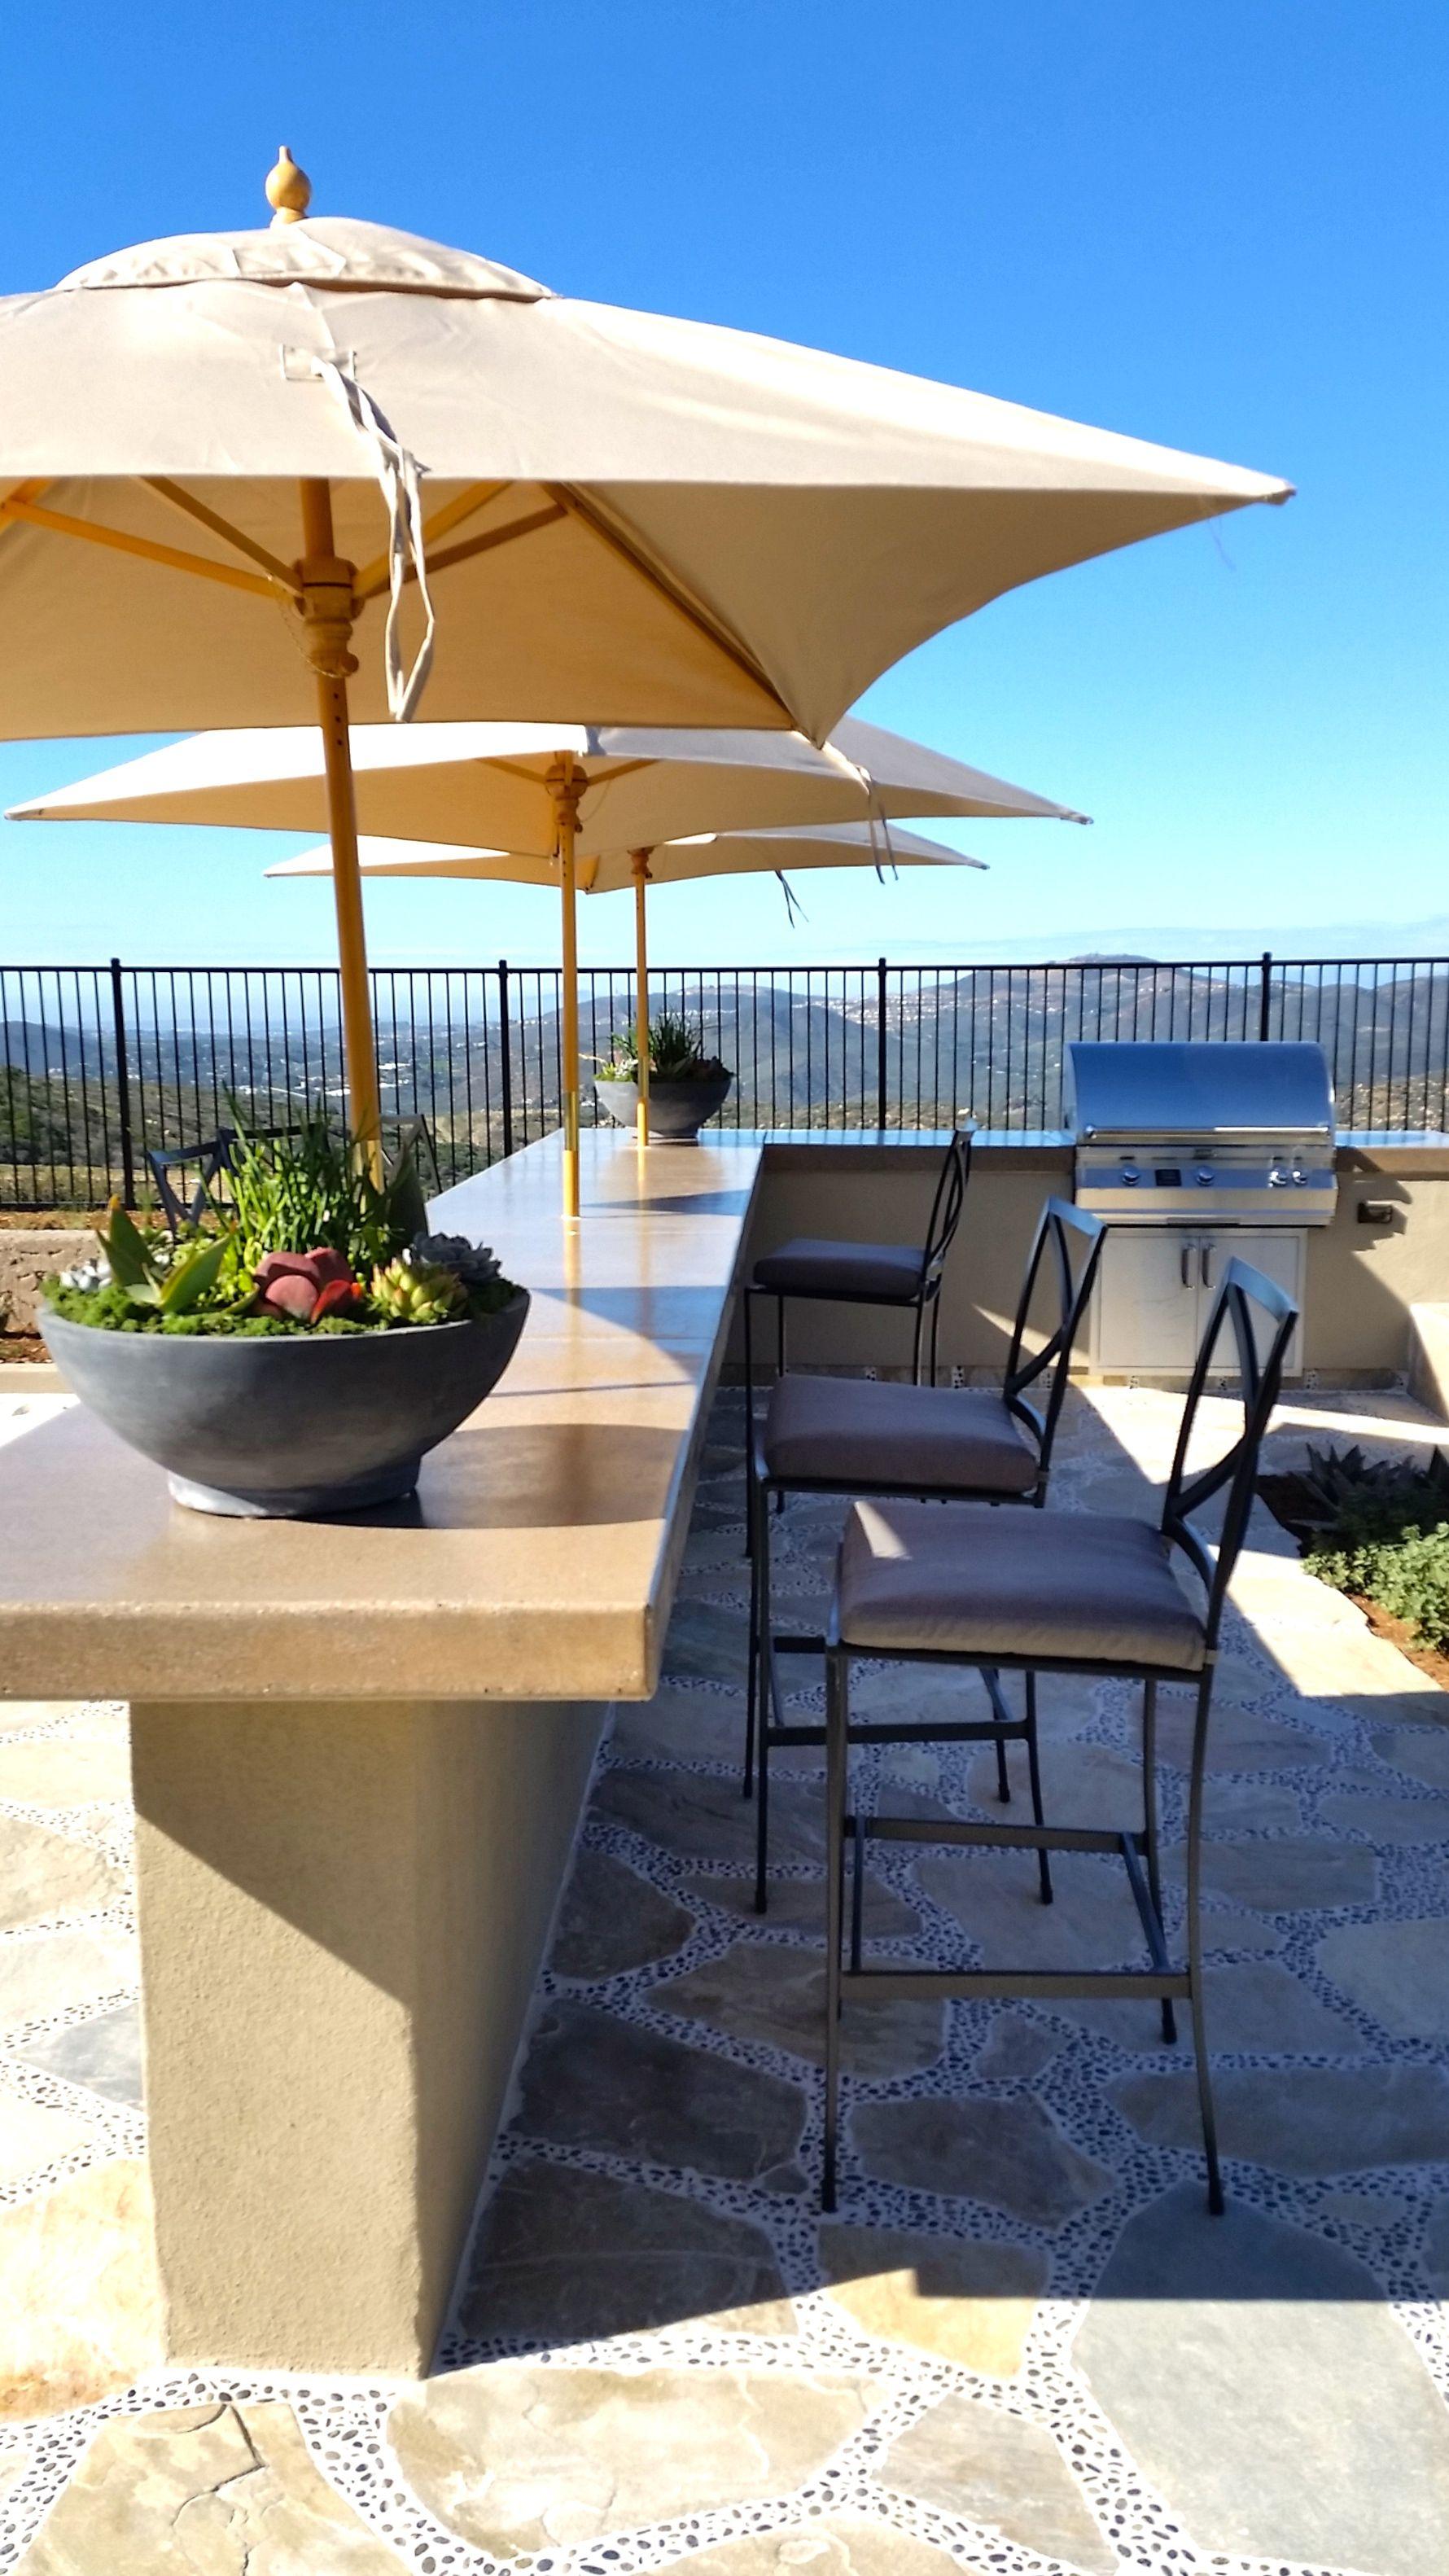 Enjoy life on the #patio.